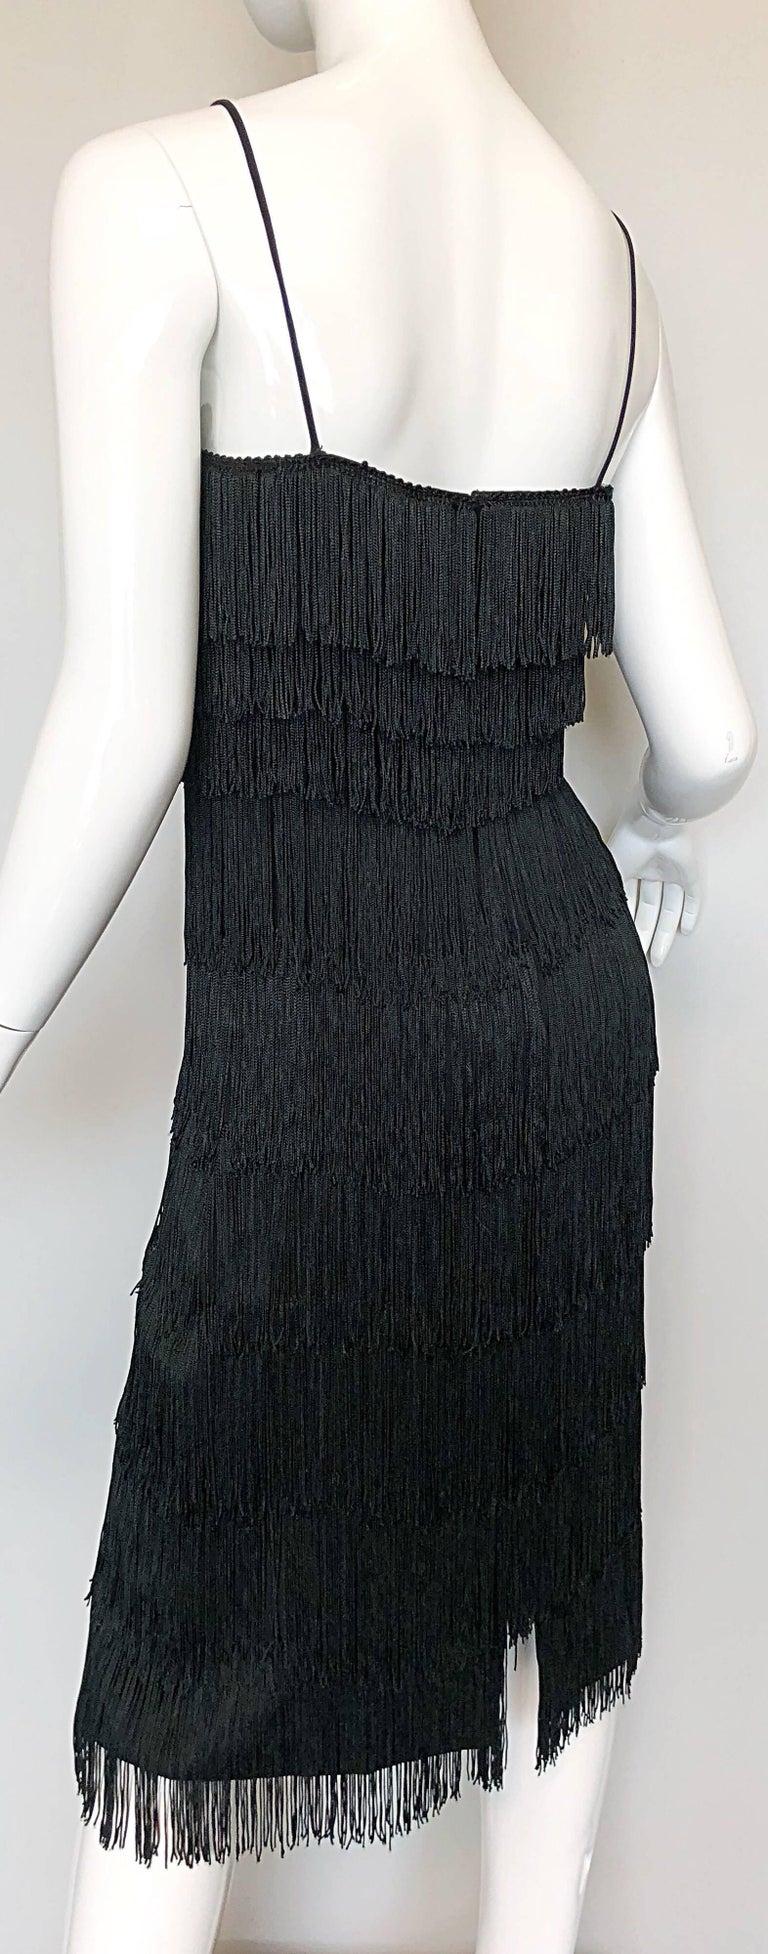 1970s Lilli Diamond Black Fully Fringed Vintage Flapper Style 70s Cocktail Dress For Sale 4